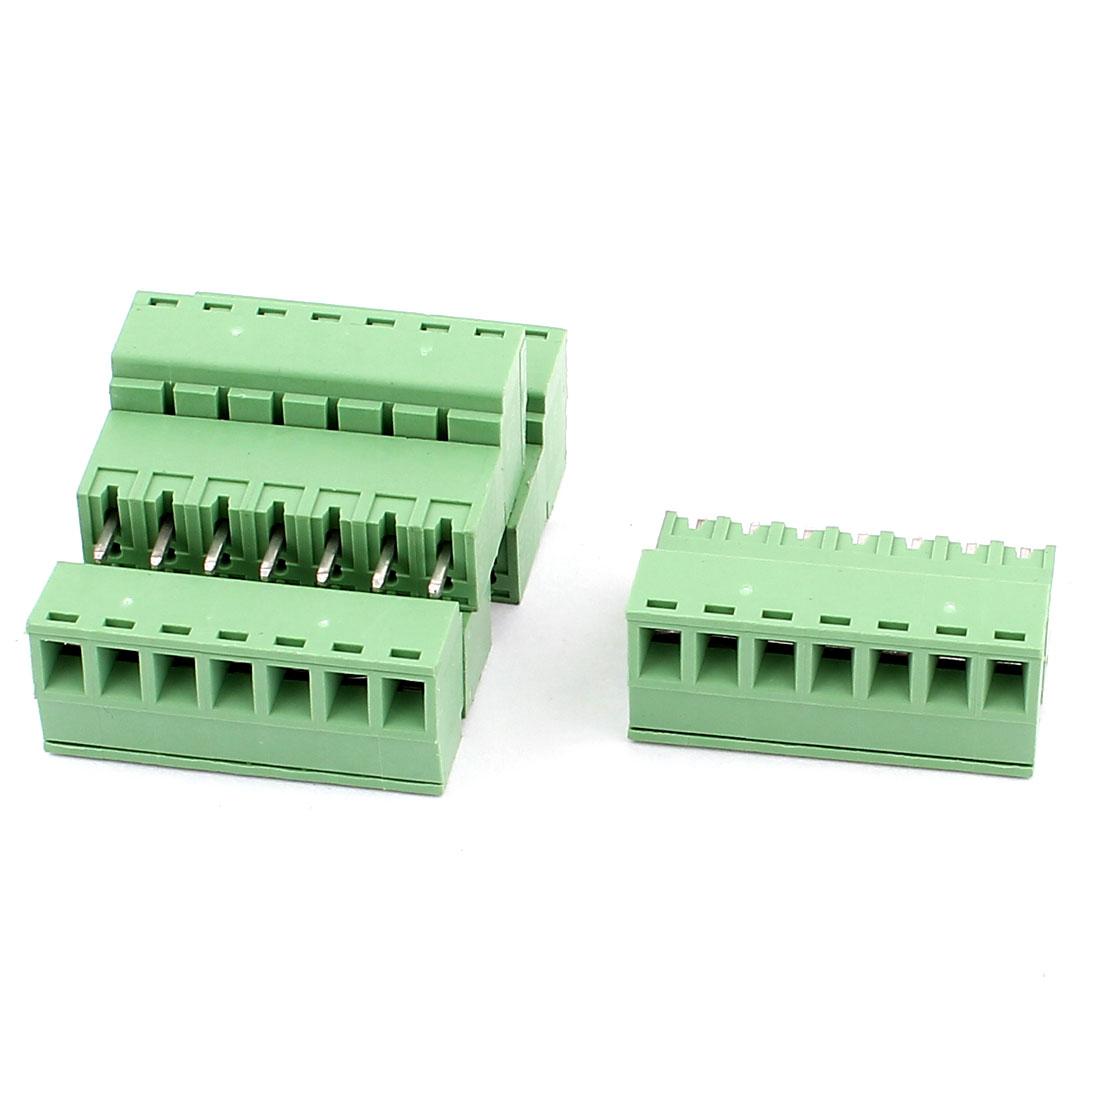 4 Pcs AC 300V 8A 7 Pins PCB Terminal Block Connector 3.81mm Pitch Green